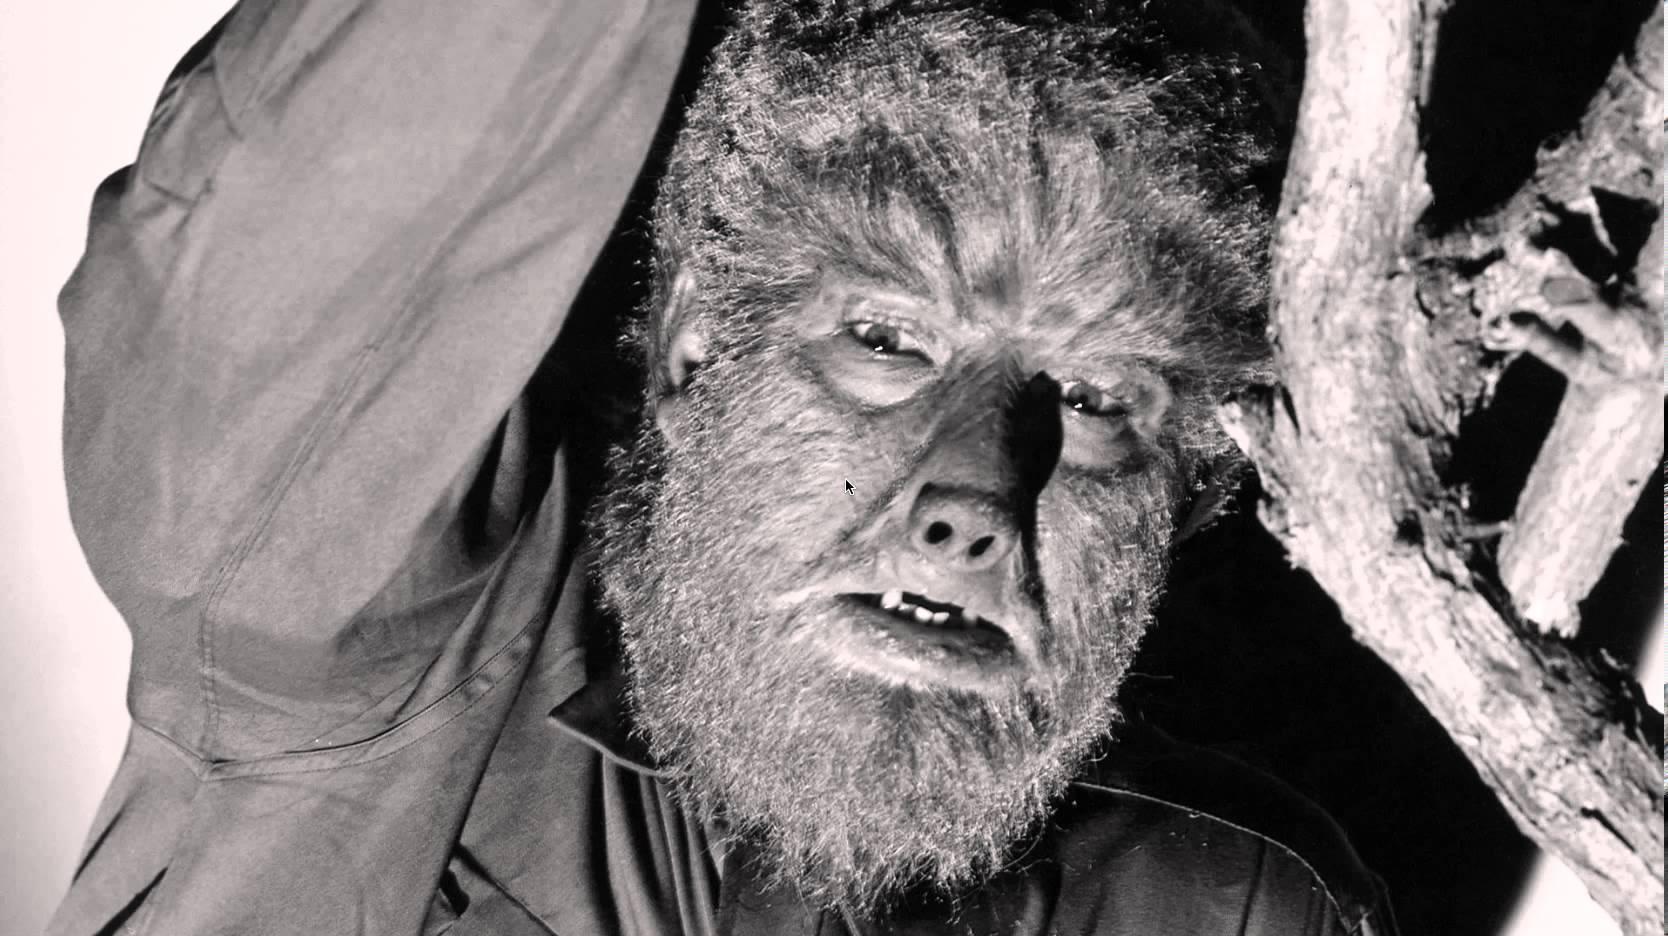 I 5 migliori classici horror targati Universal 5